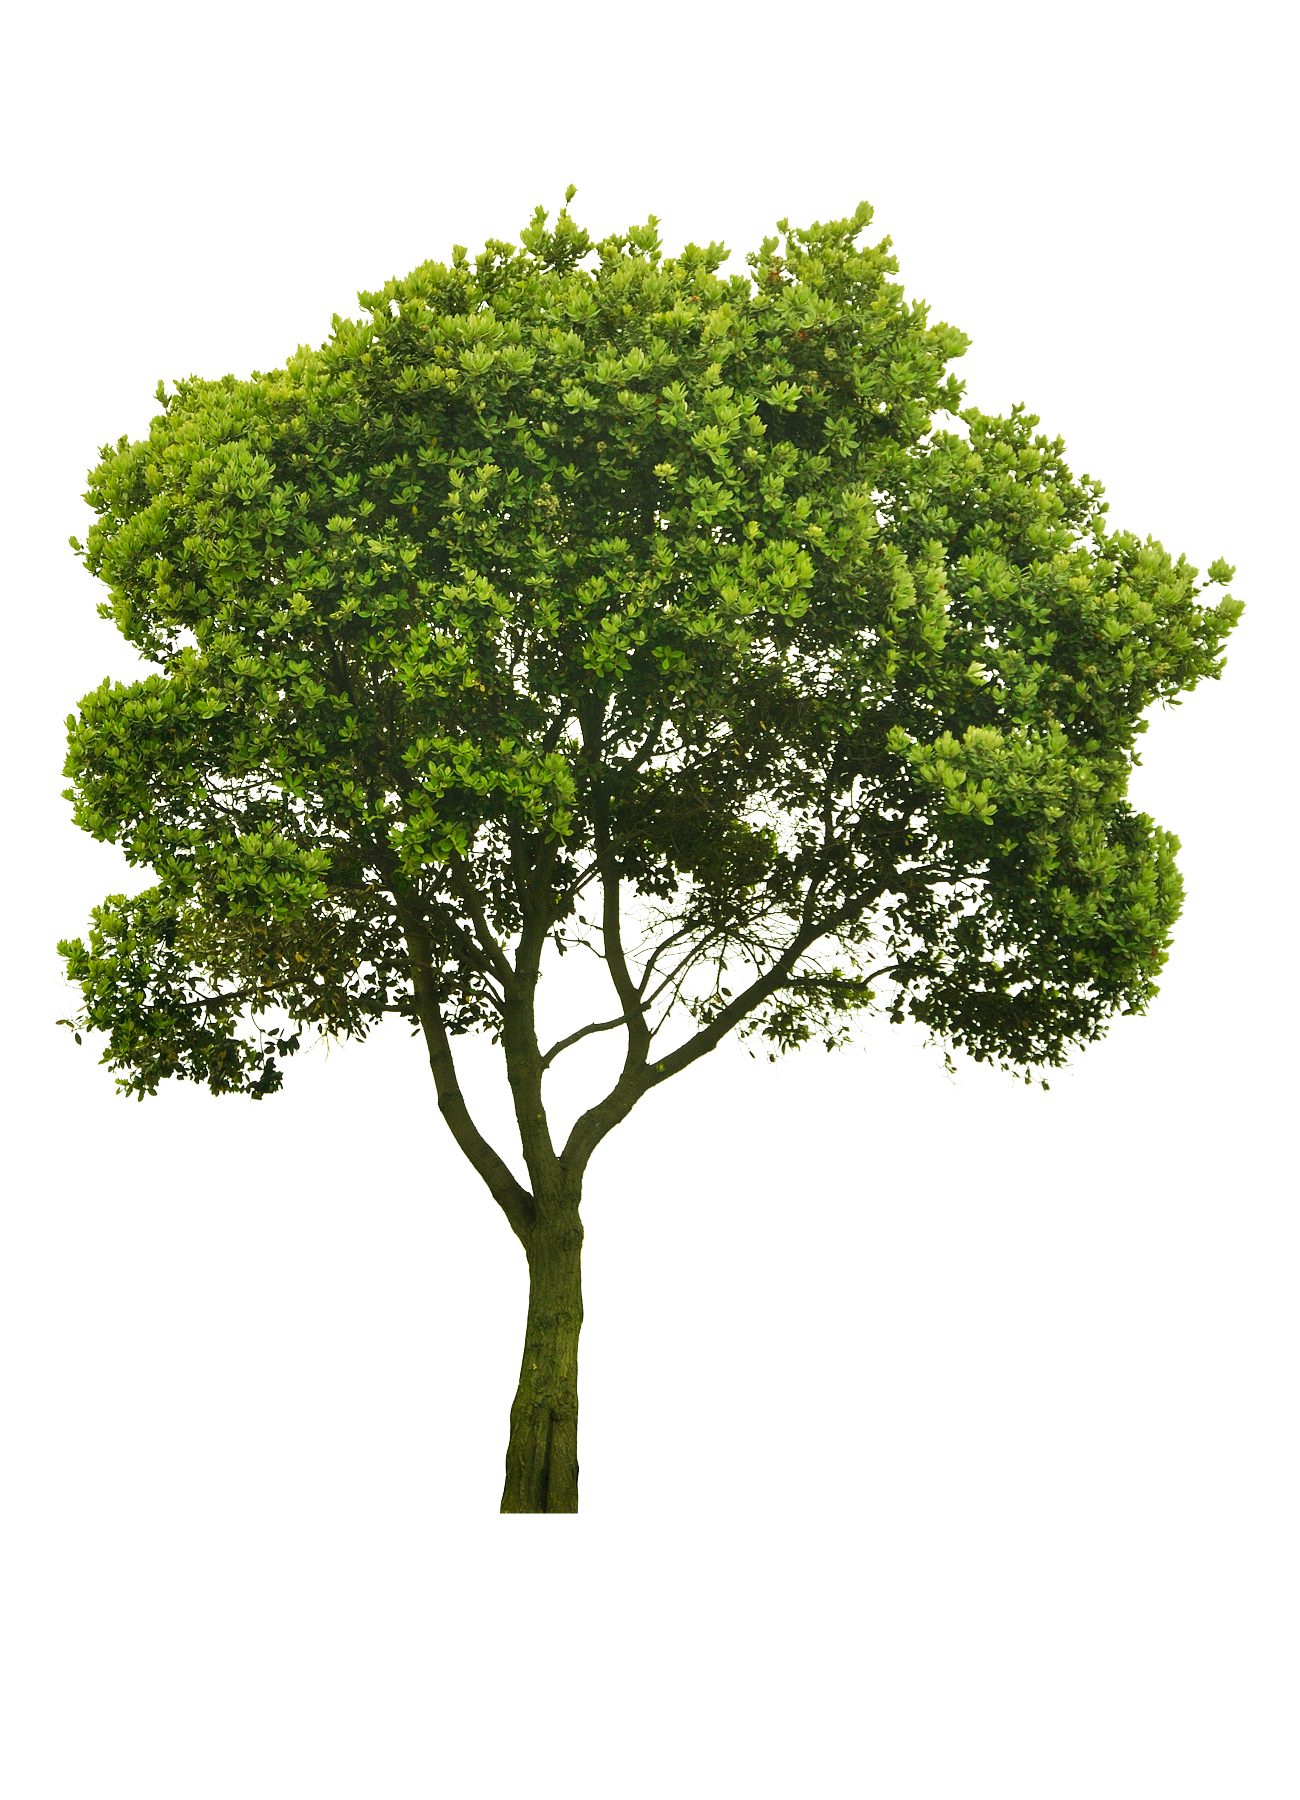 Landscape clipart hedge cutting. Cutout tree png pinterest